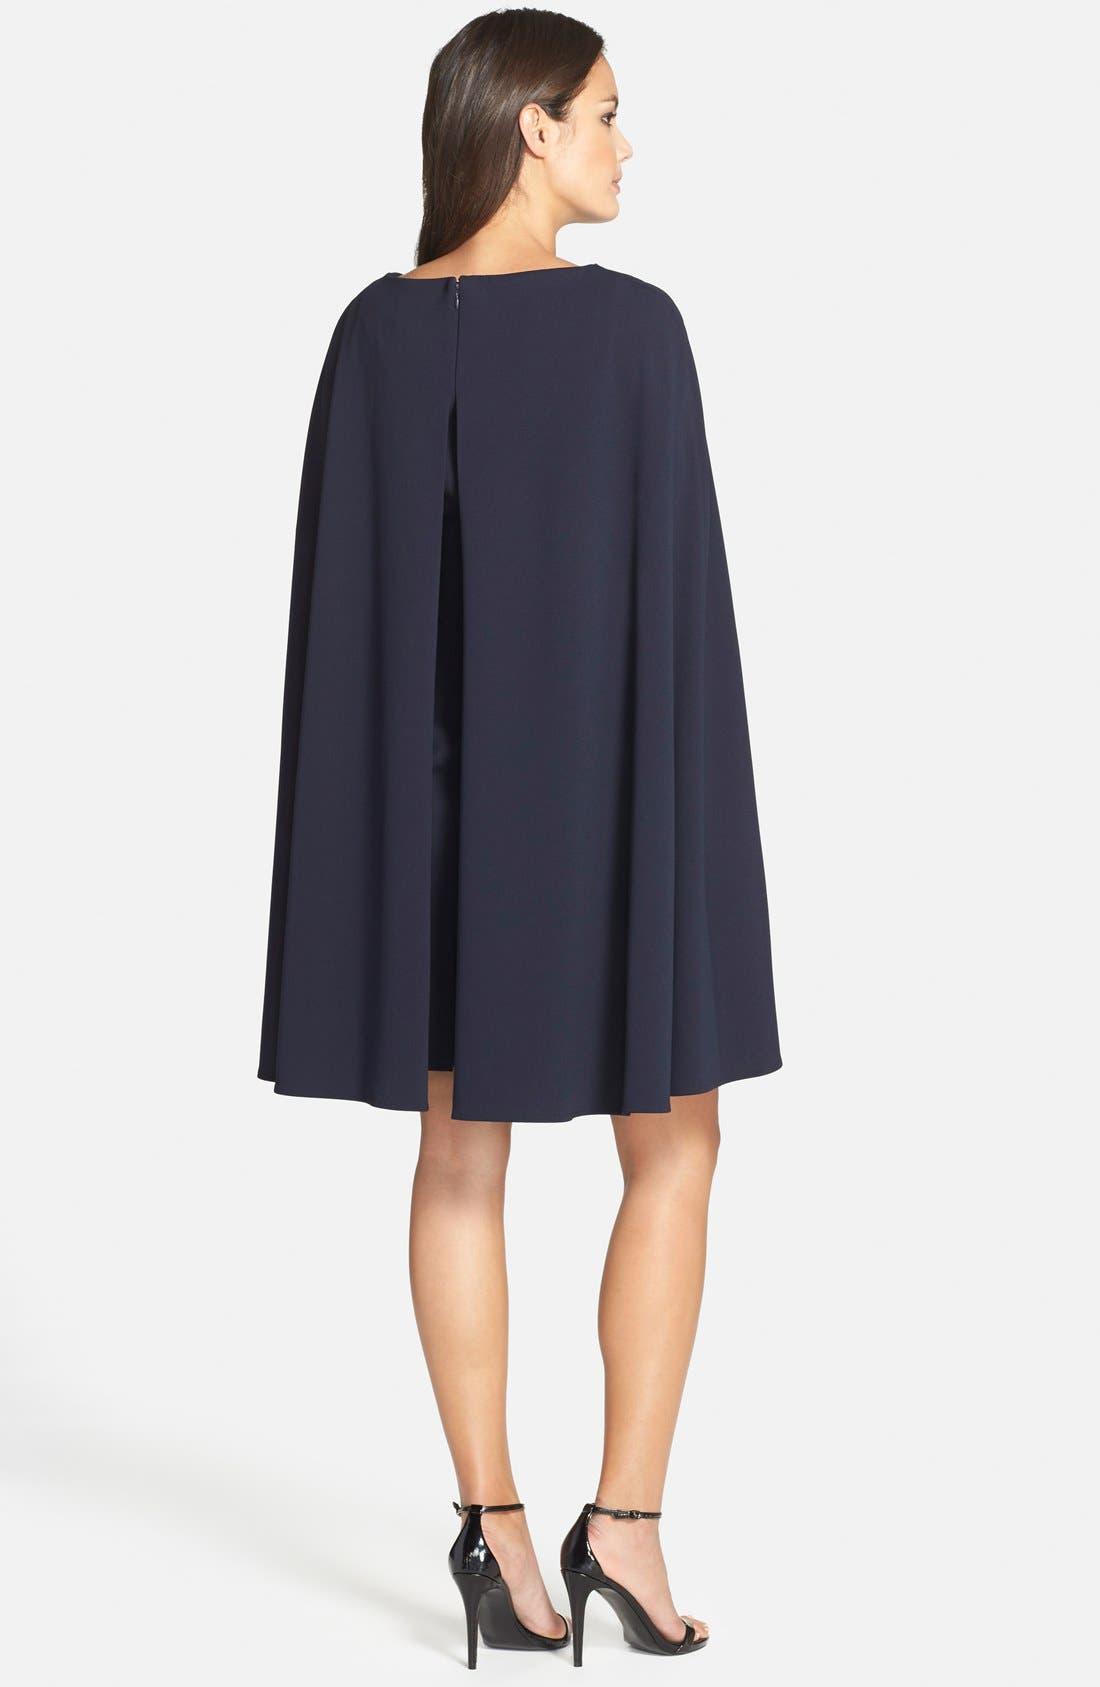 ADRIANNA PAPELL,                             Cape Sheath Dress,                             Alternate thumbnail 2, color,                             412